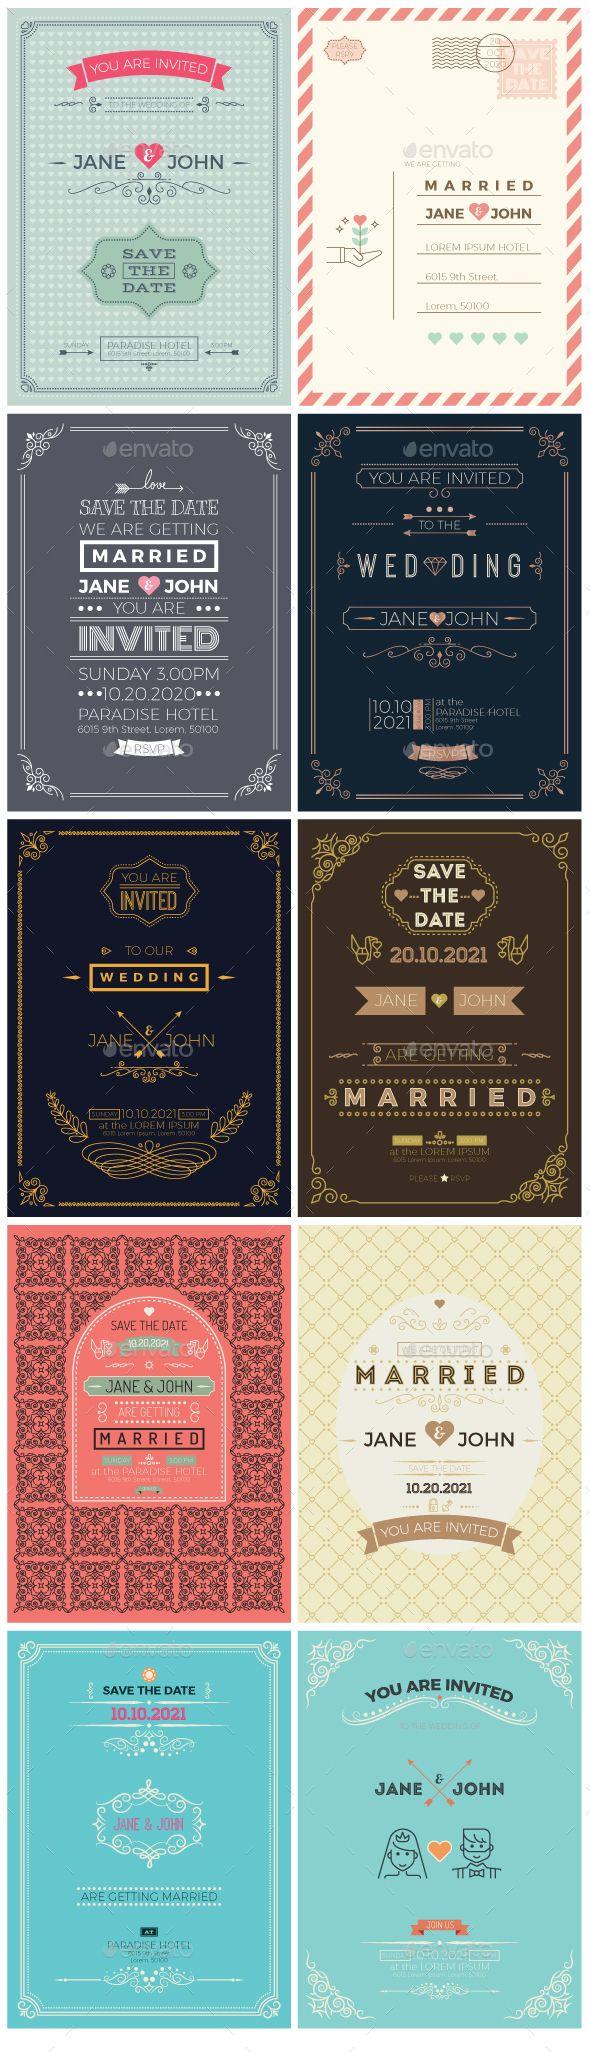 vintage wedding card design template%0A    Wedding Invitation Card Templates